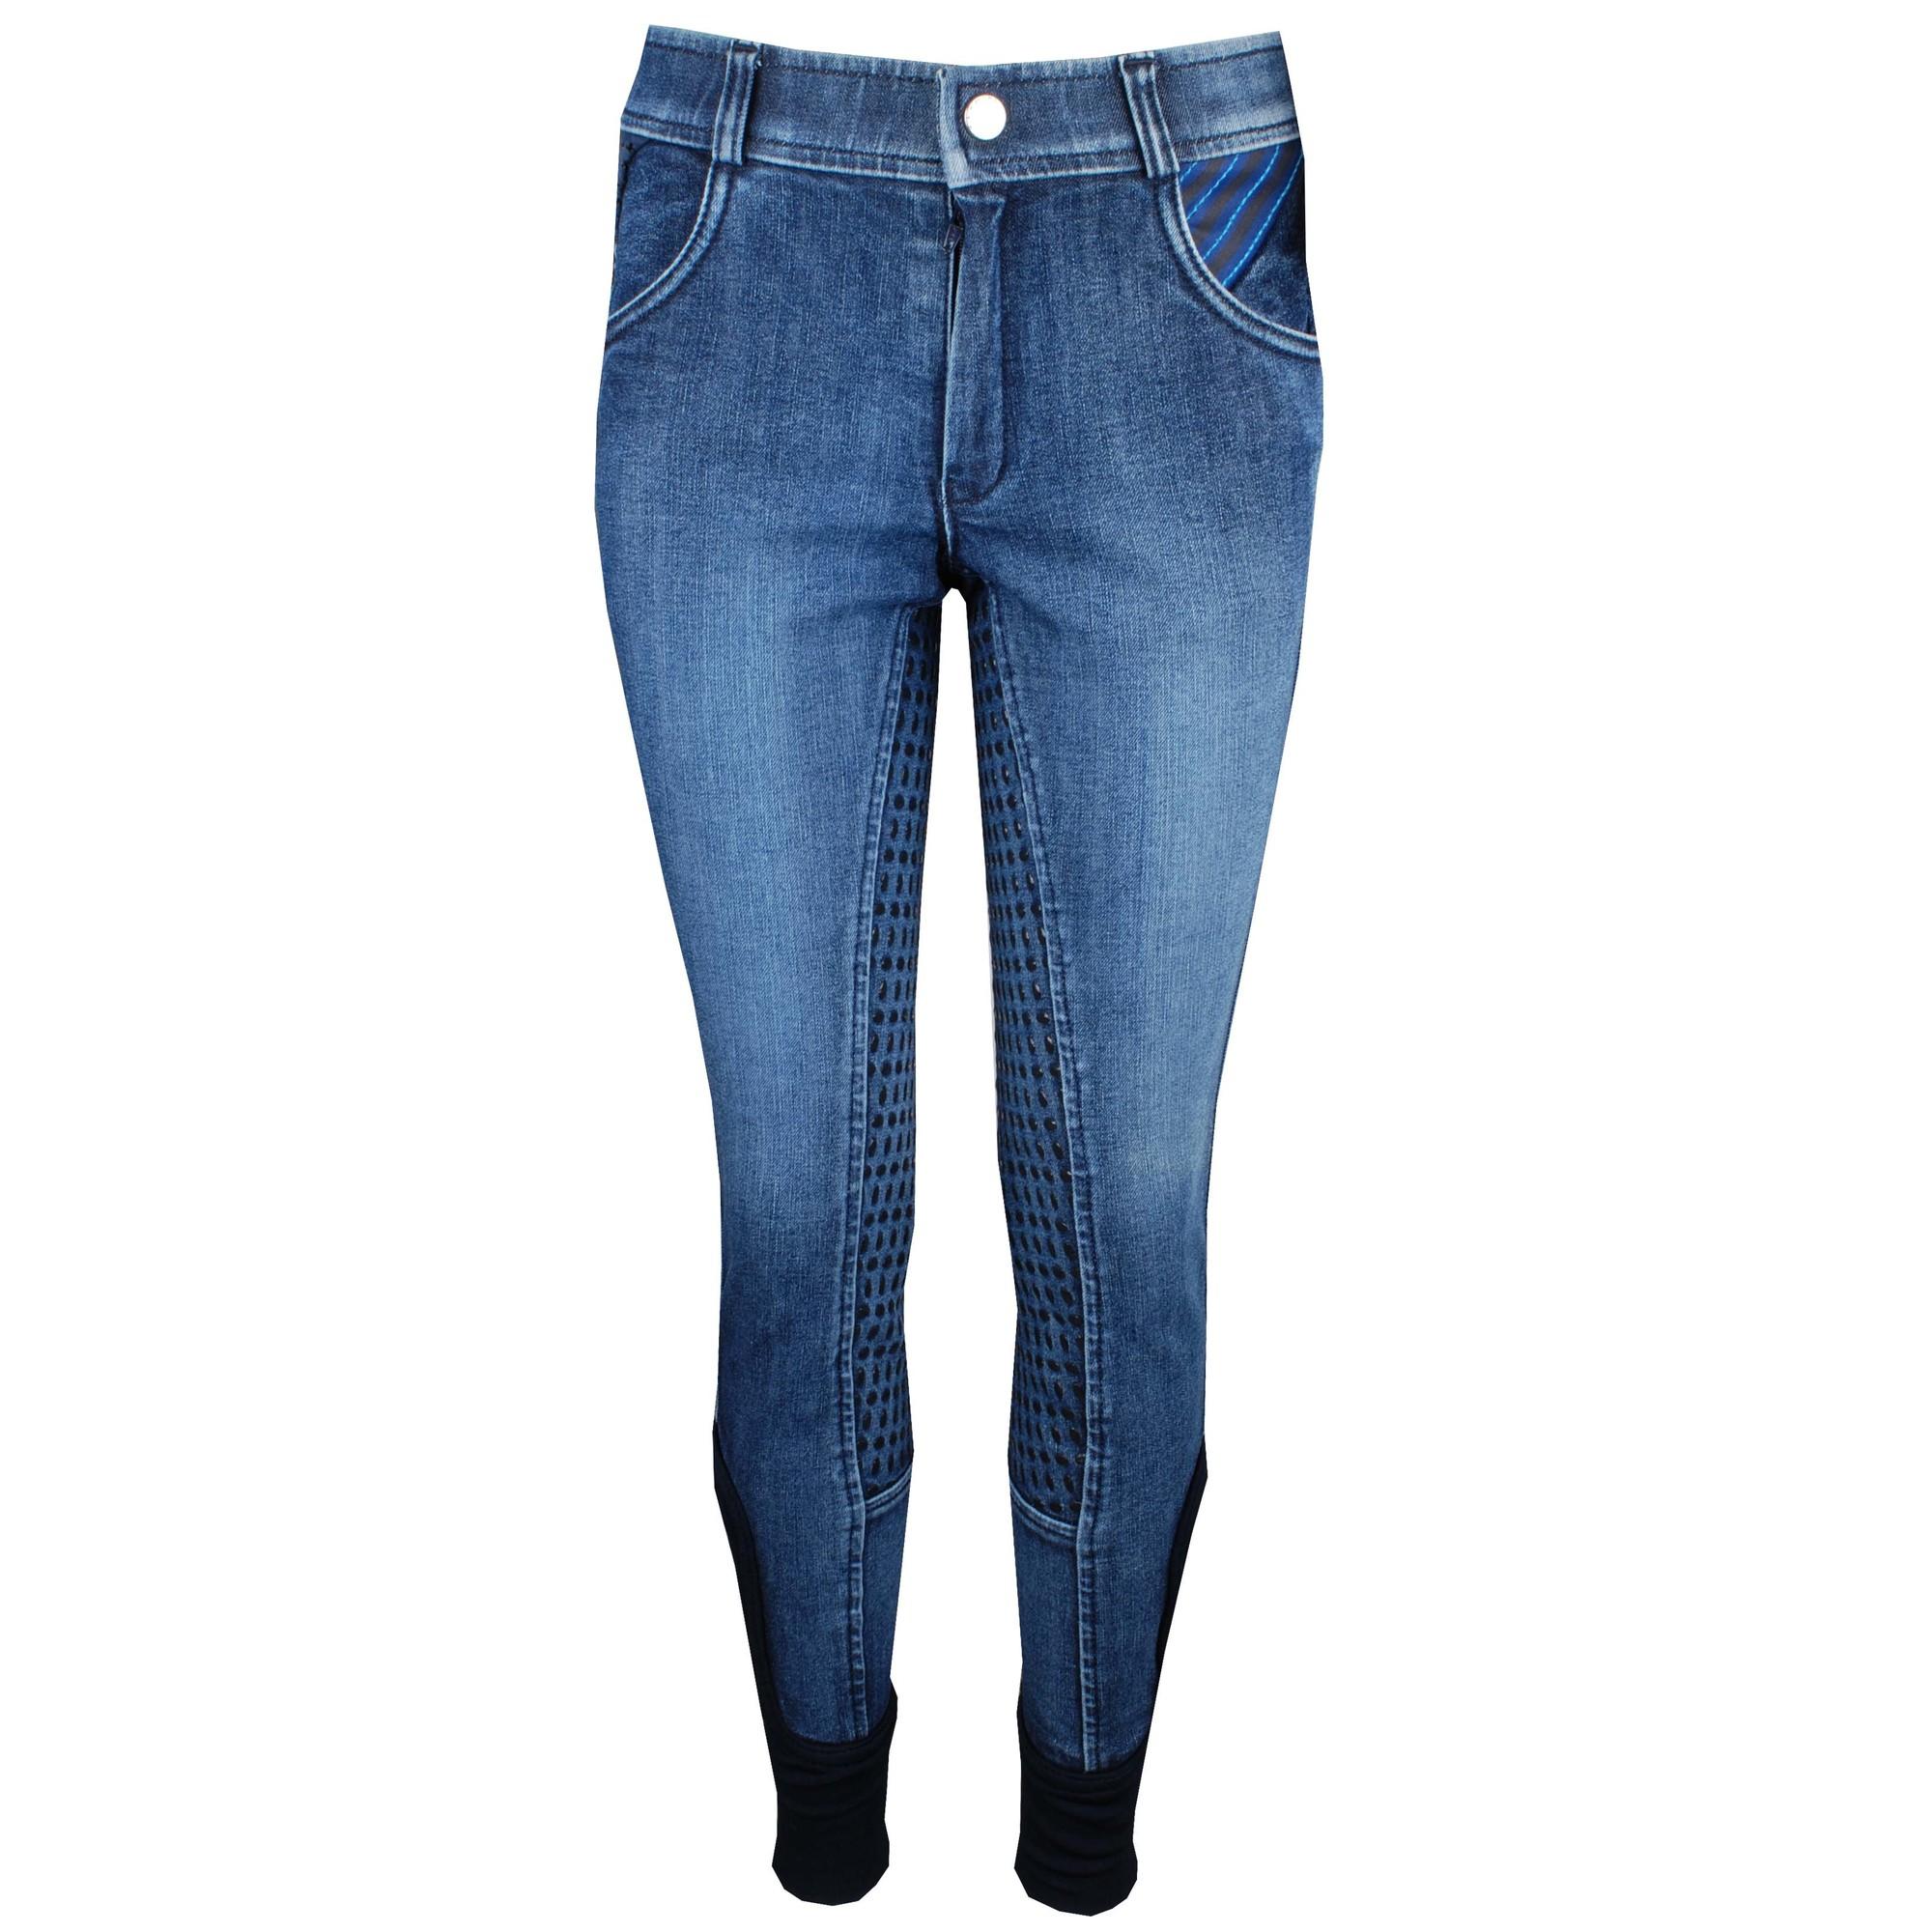 Harrys Horse Loulou Bowhill kinder rijbroek jeans maat:140